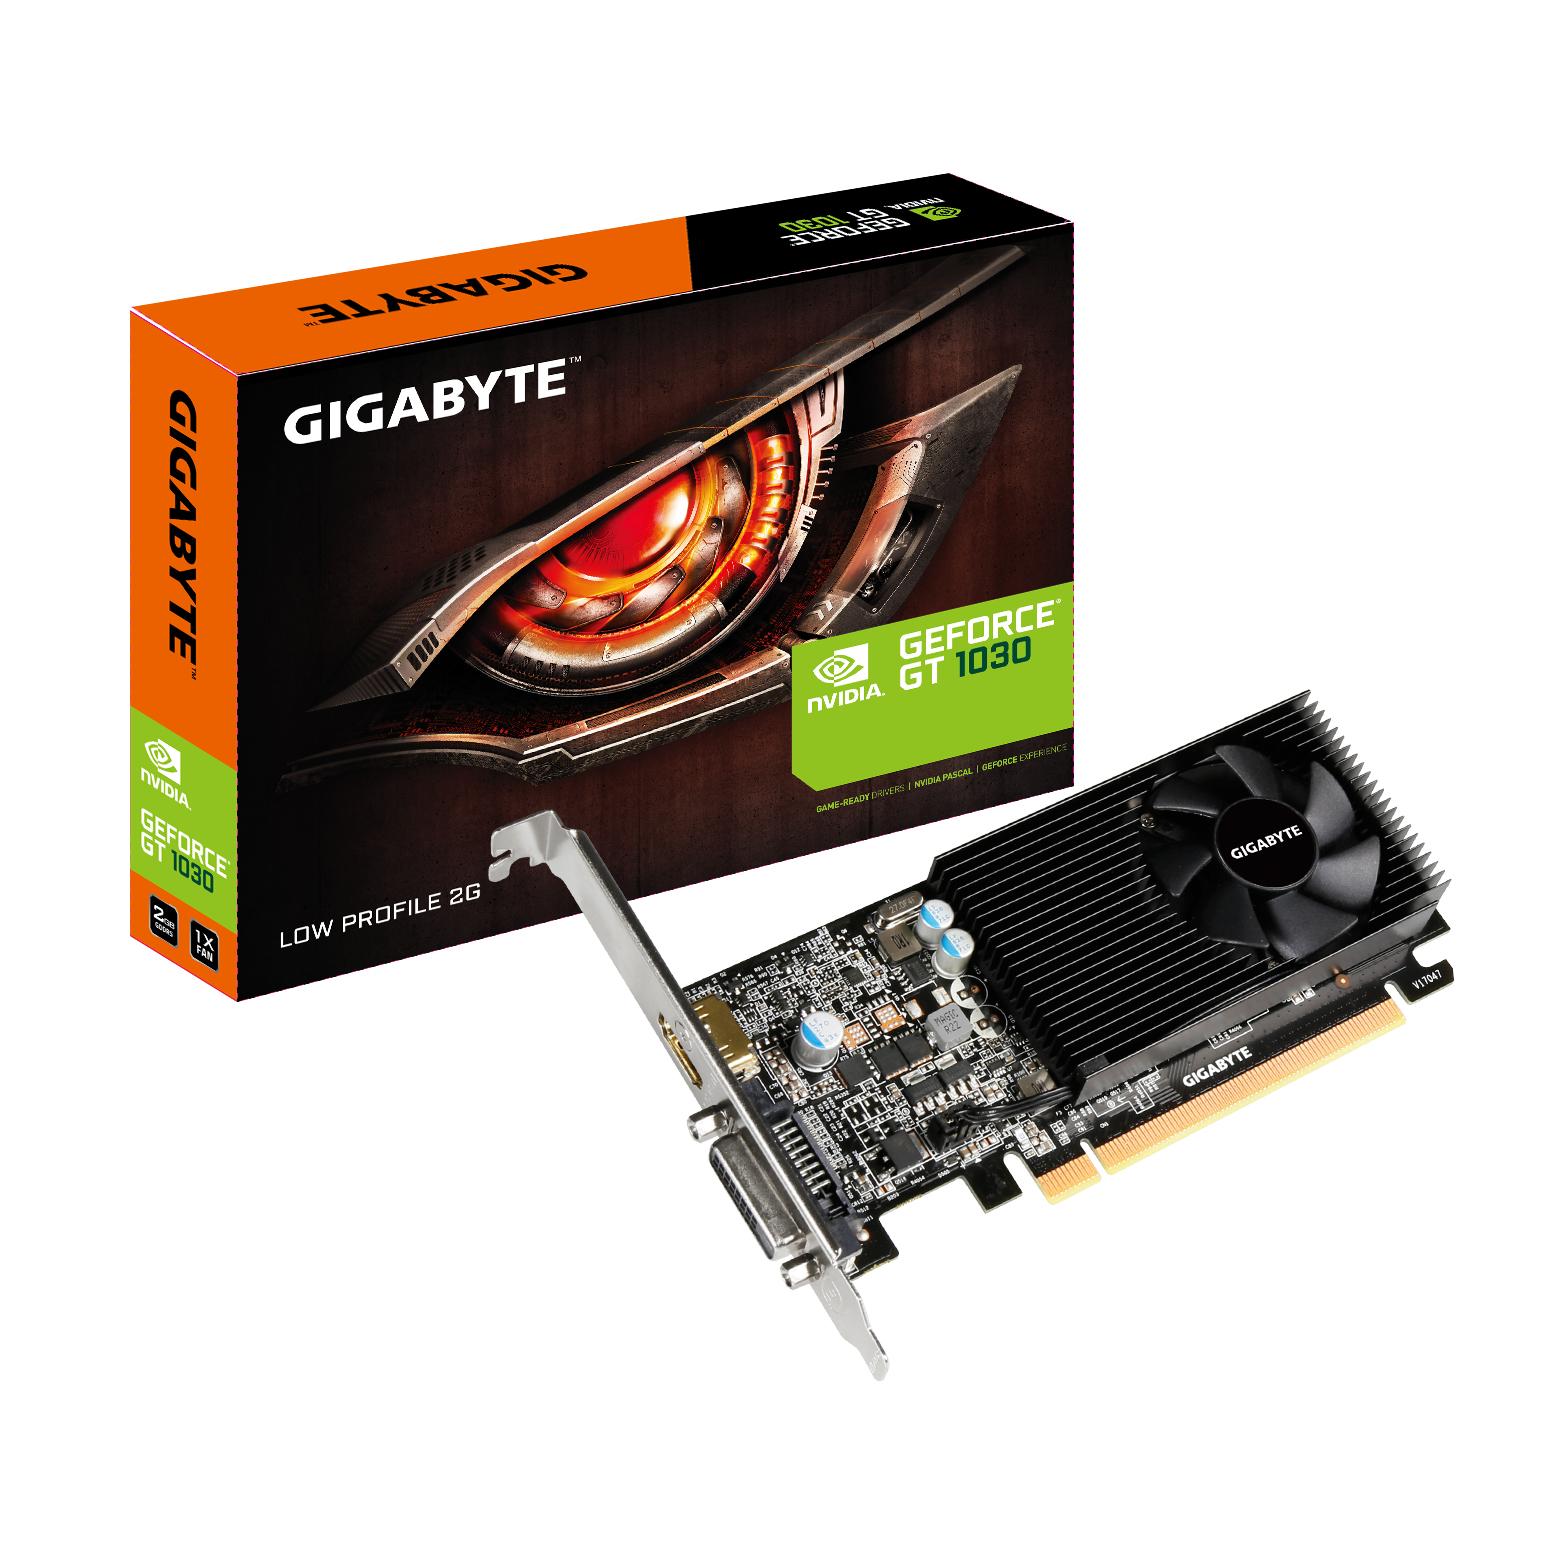 GV-N1030D5-2GL Geforce GT 1030 (2 GB GDDR5, PCIe 3.0 low profile, DVI, HDMI)